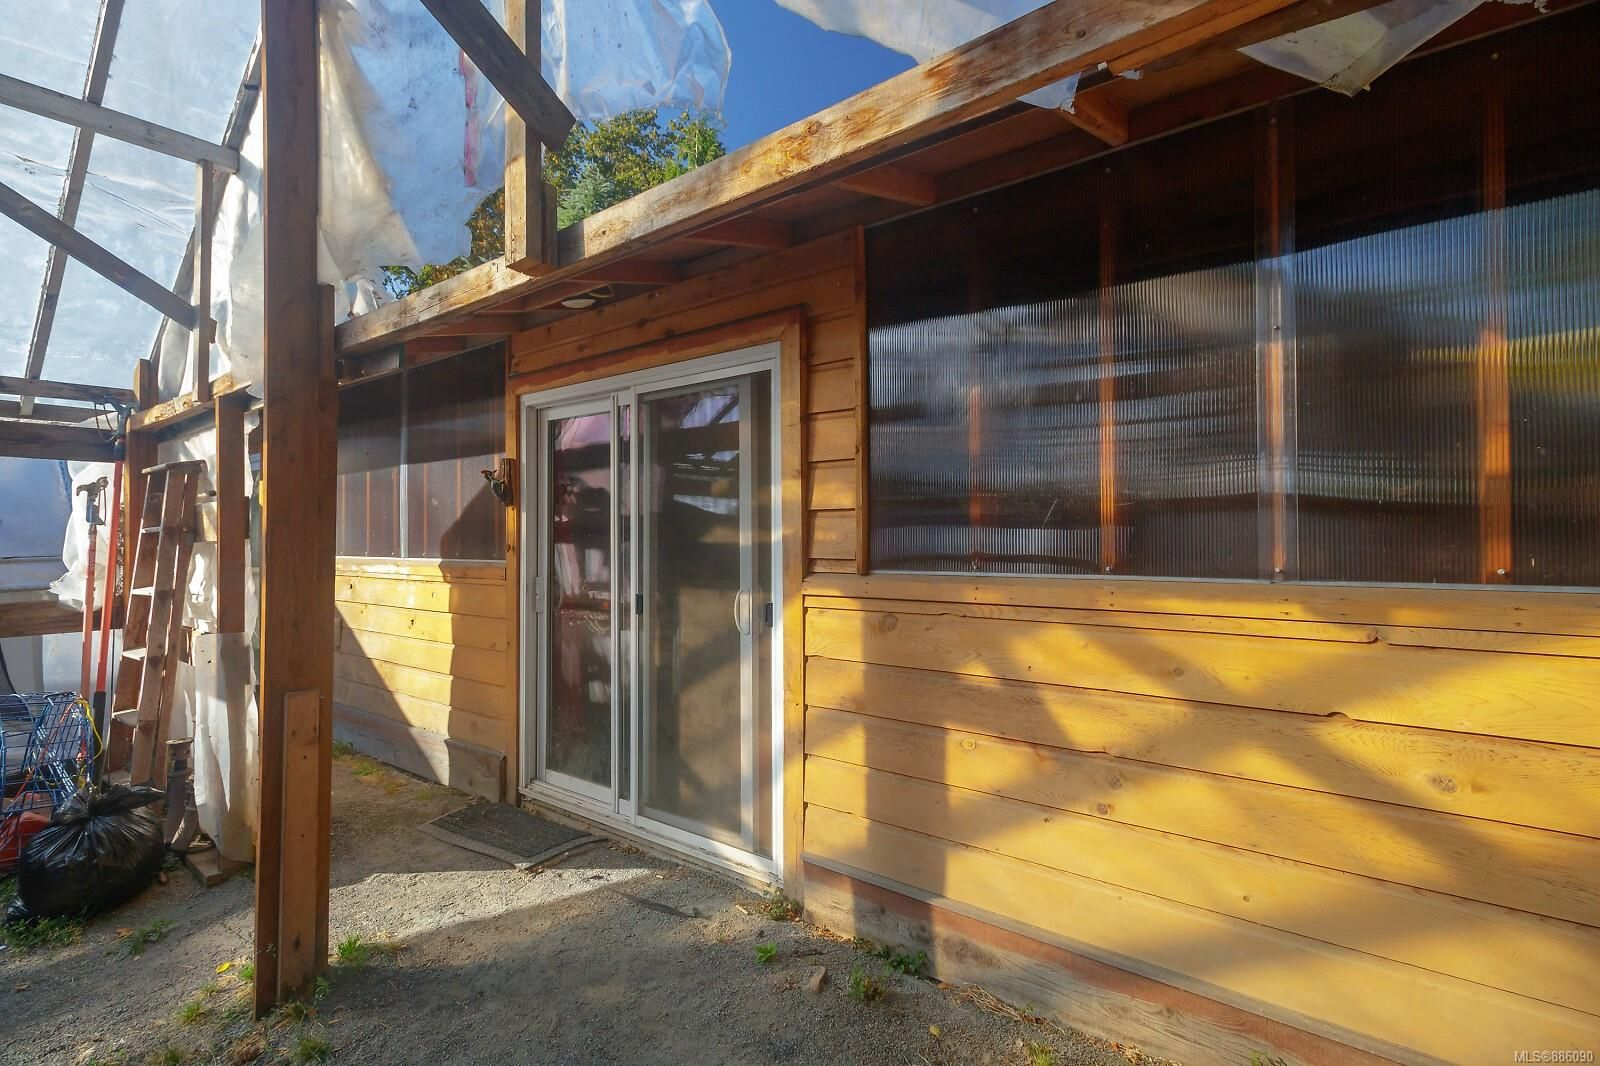 Photo 39: Photos: 4553 Blenkinsop Rd in : SE Blenkinsop House for sale (Saanich East)  : MLS®# 886090